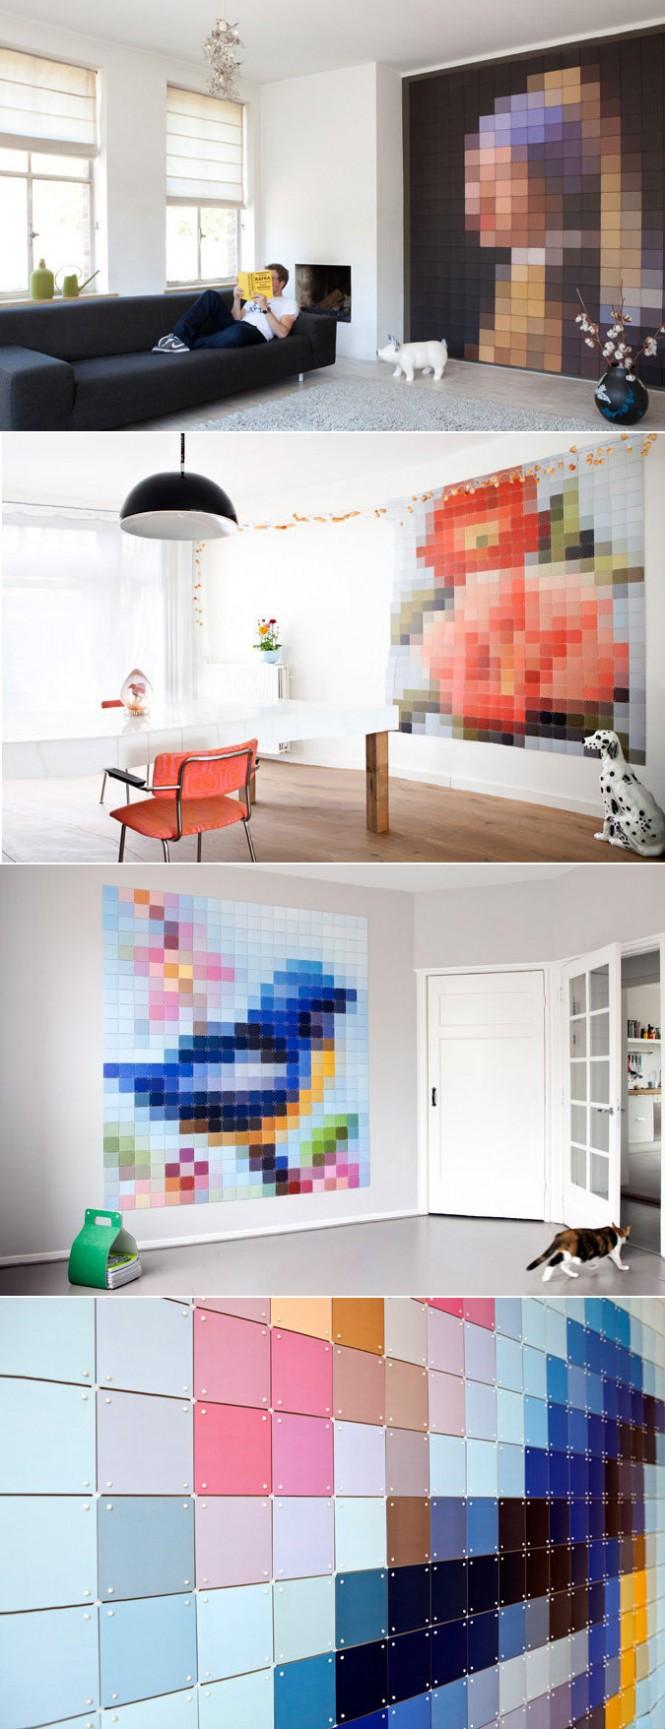 vdohnovlenie-pikselyami-idei-dekora-interiera (16)